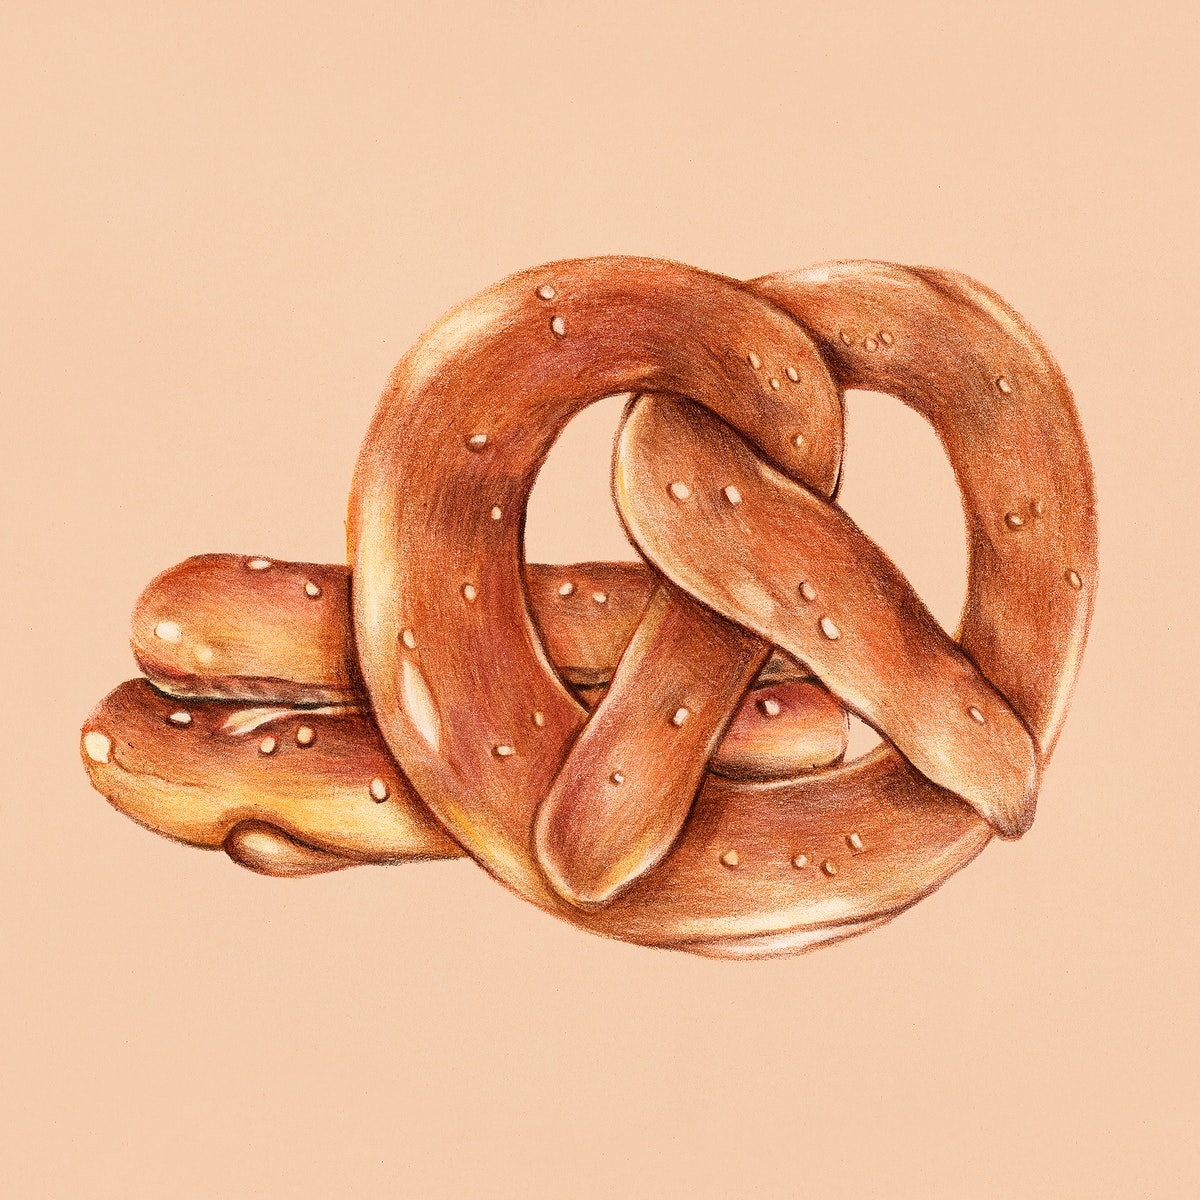 Freshly baked pretzels hand-drawn illustration